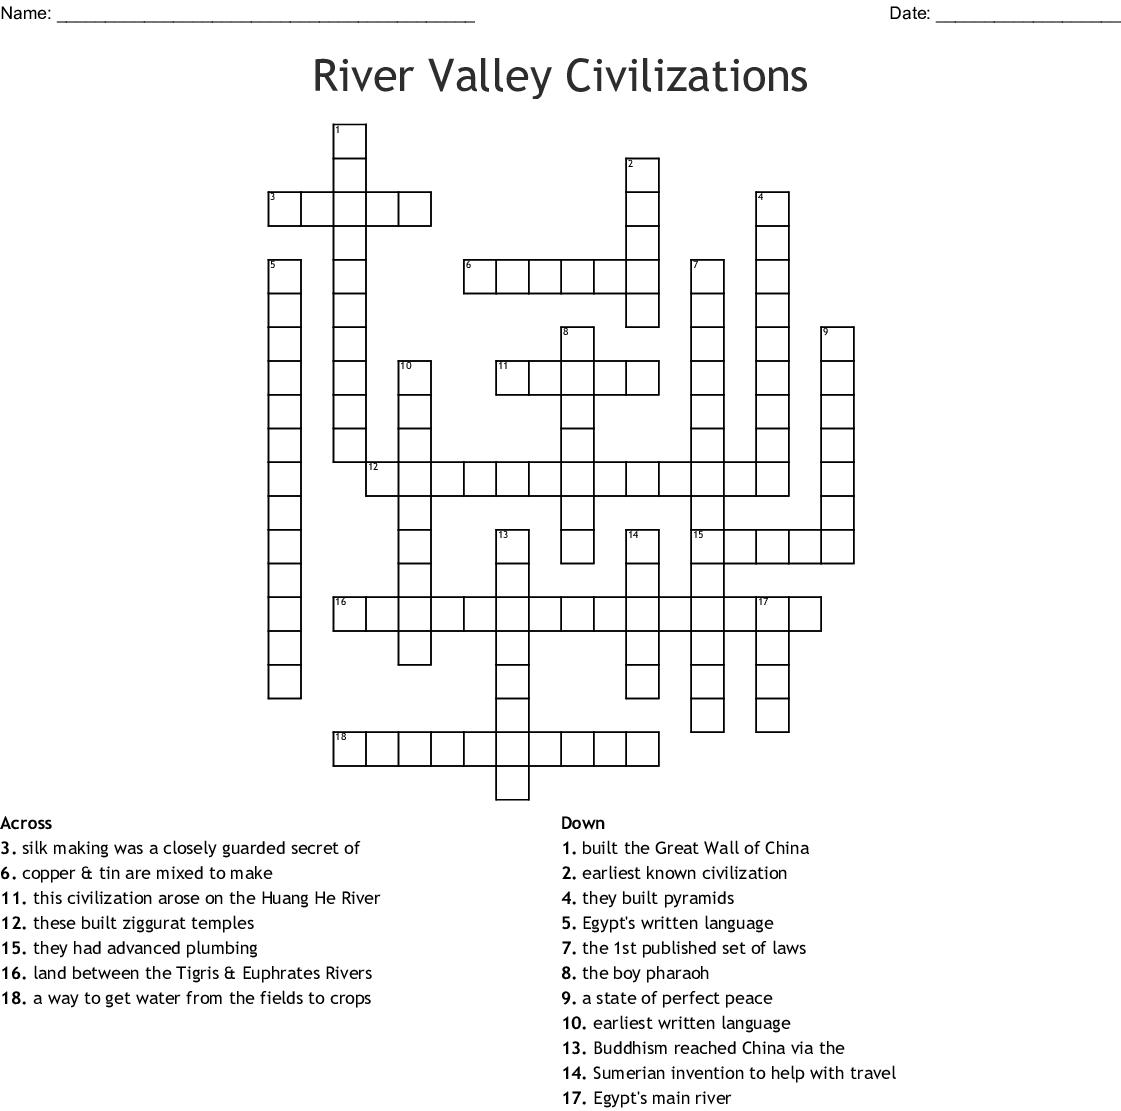 River Valley Civilizations Crossword